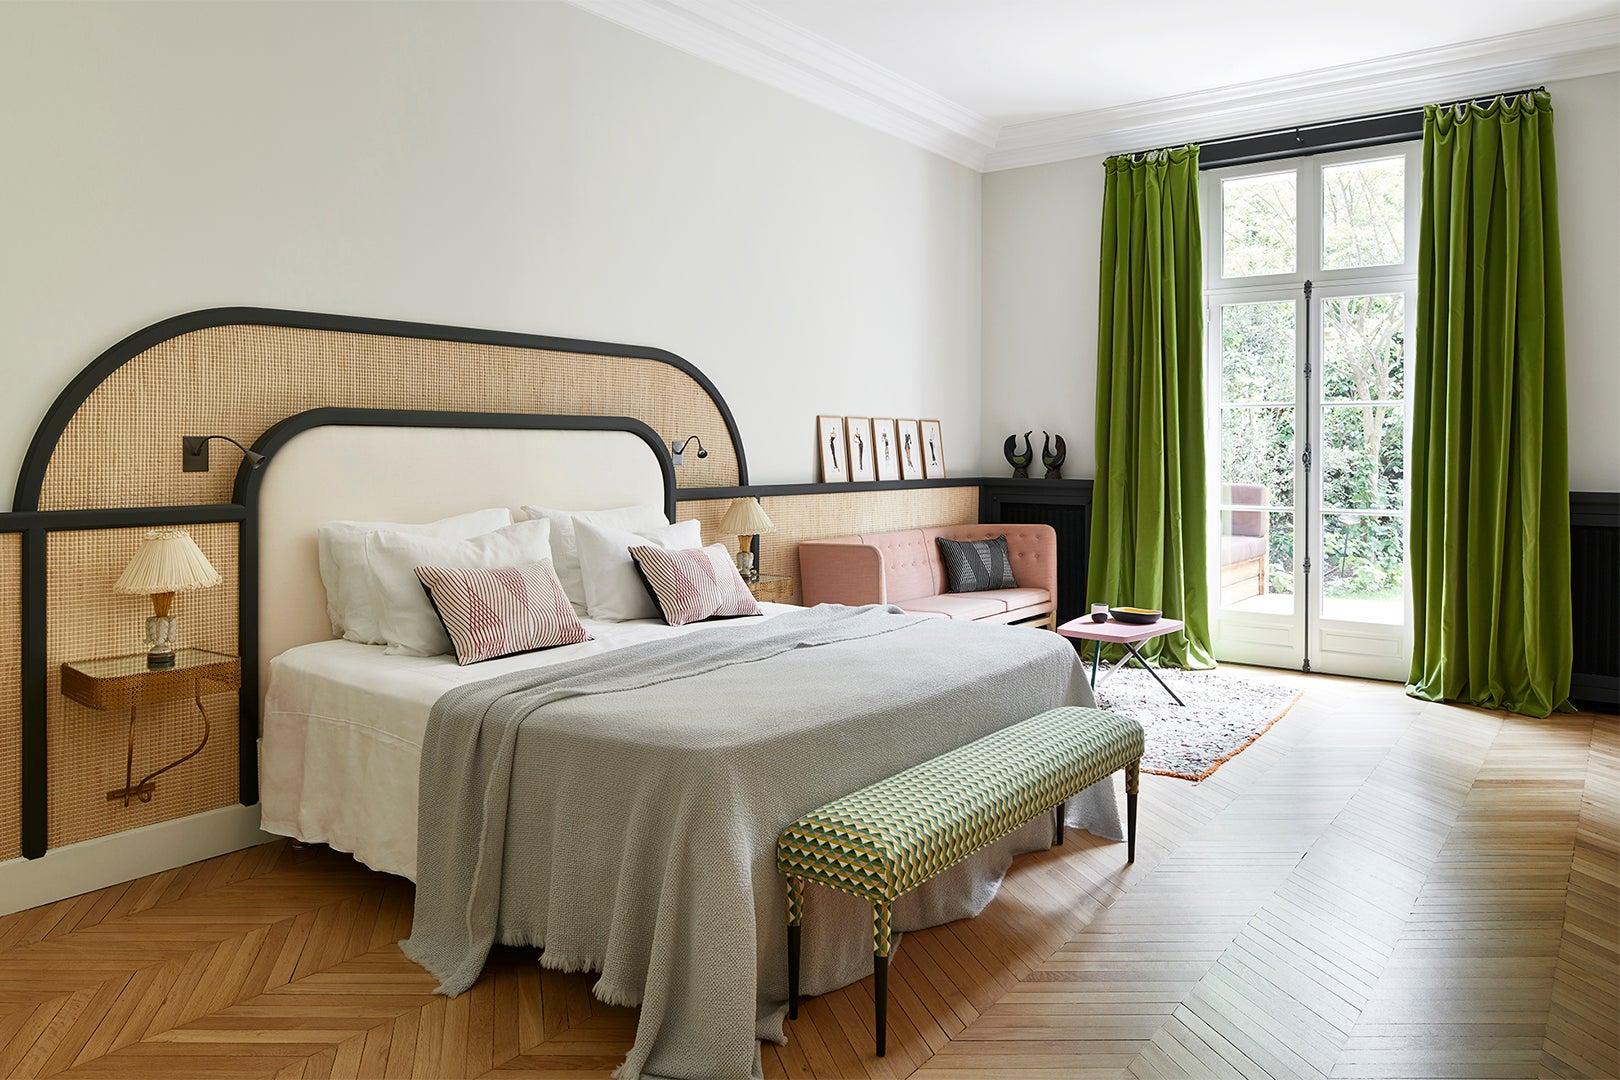 00-FEATURE-hotel-design-tips-domino